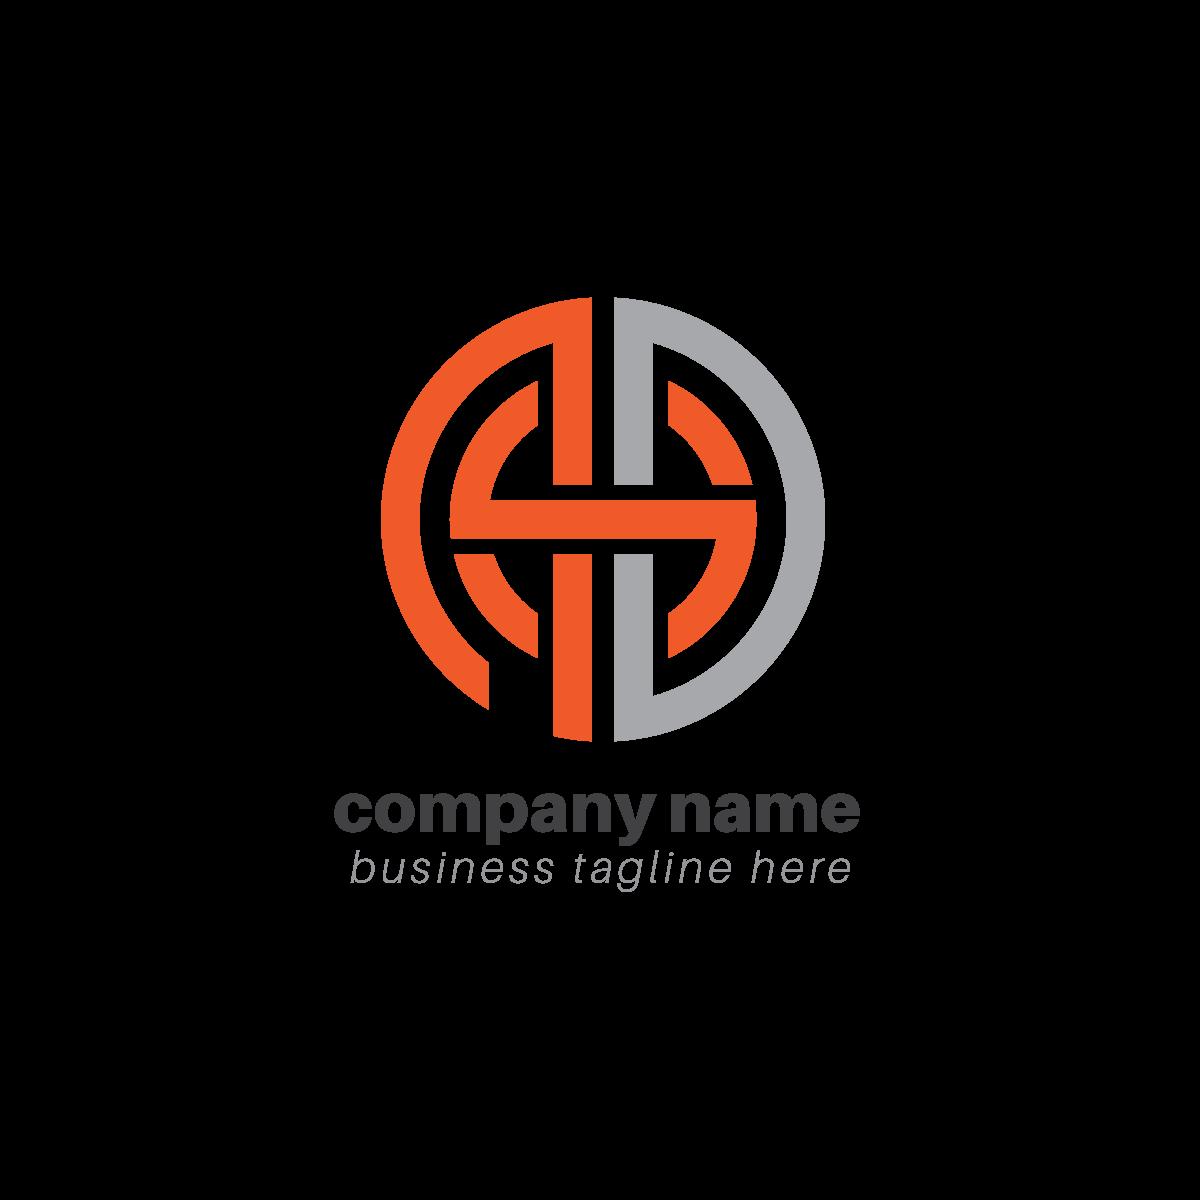 Creative-Typographic-Logo-PNG-Transparent